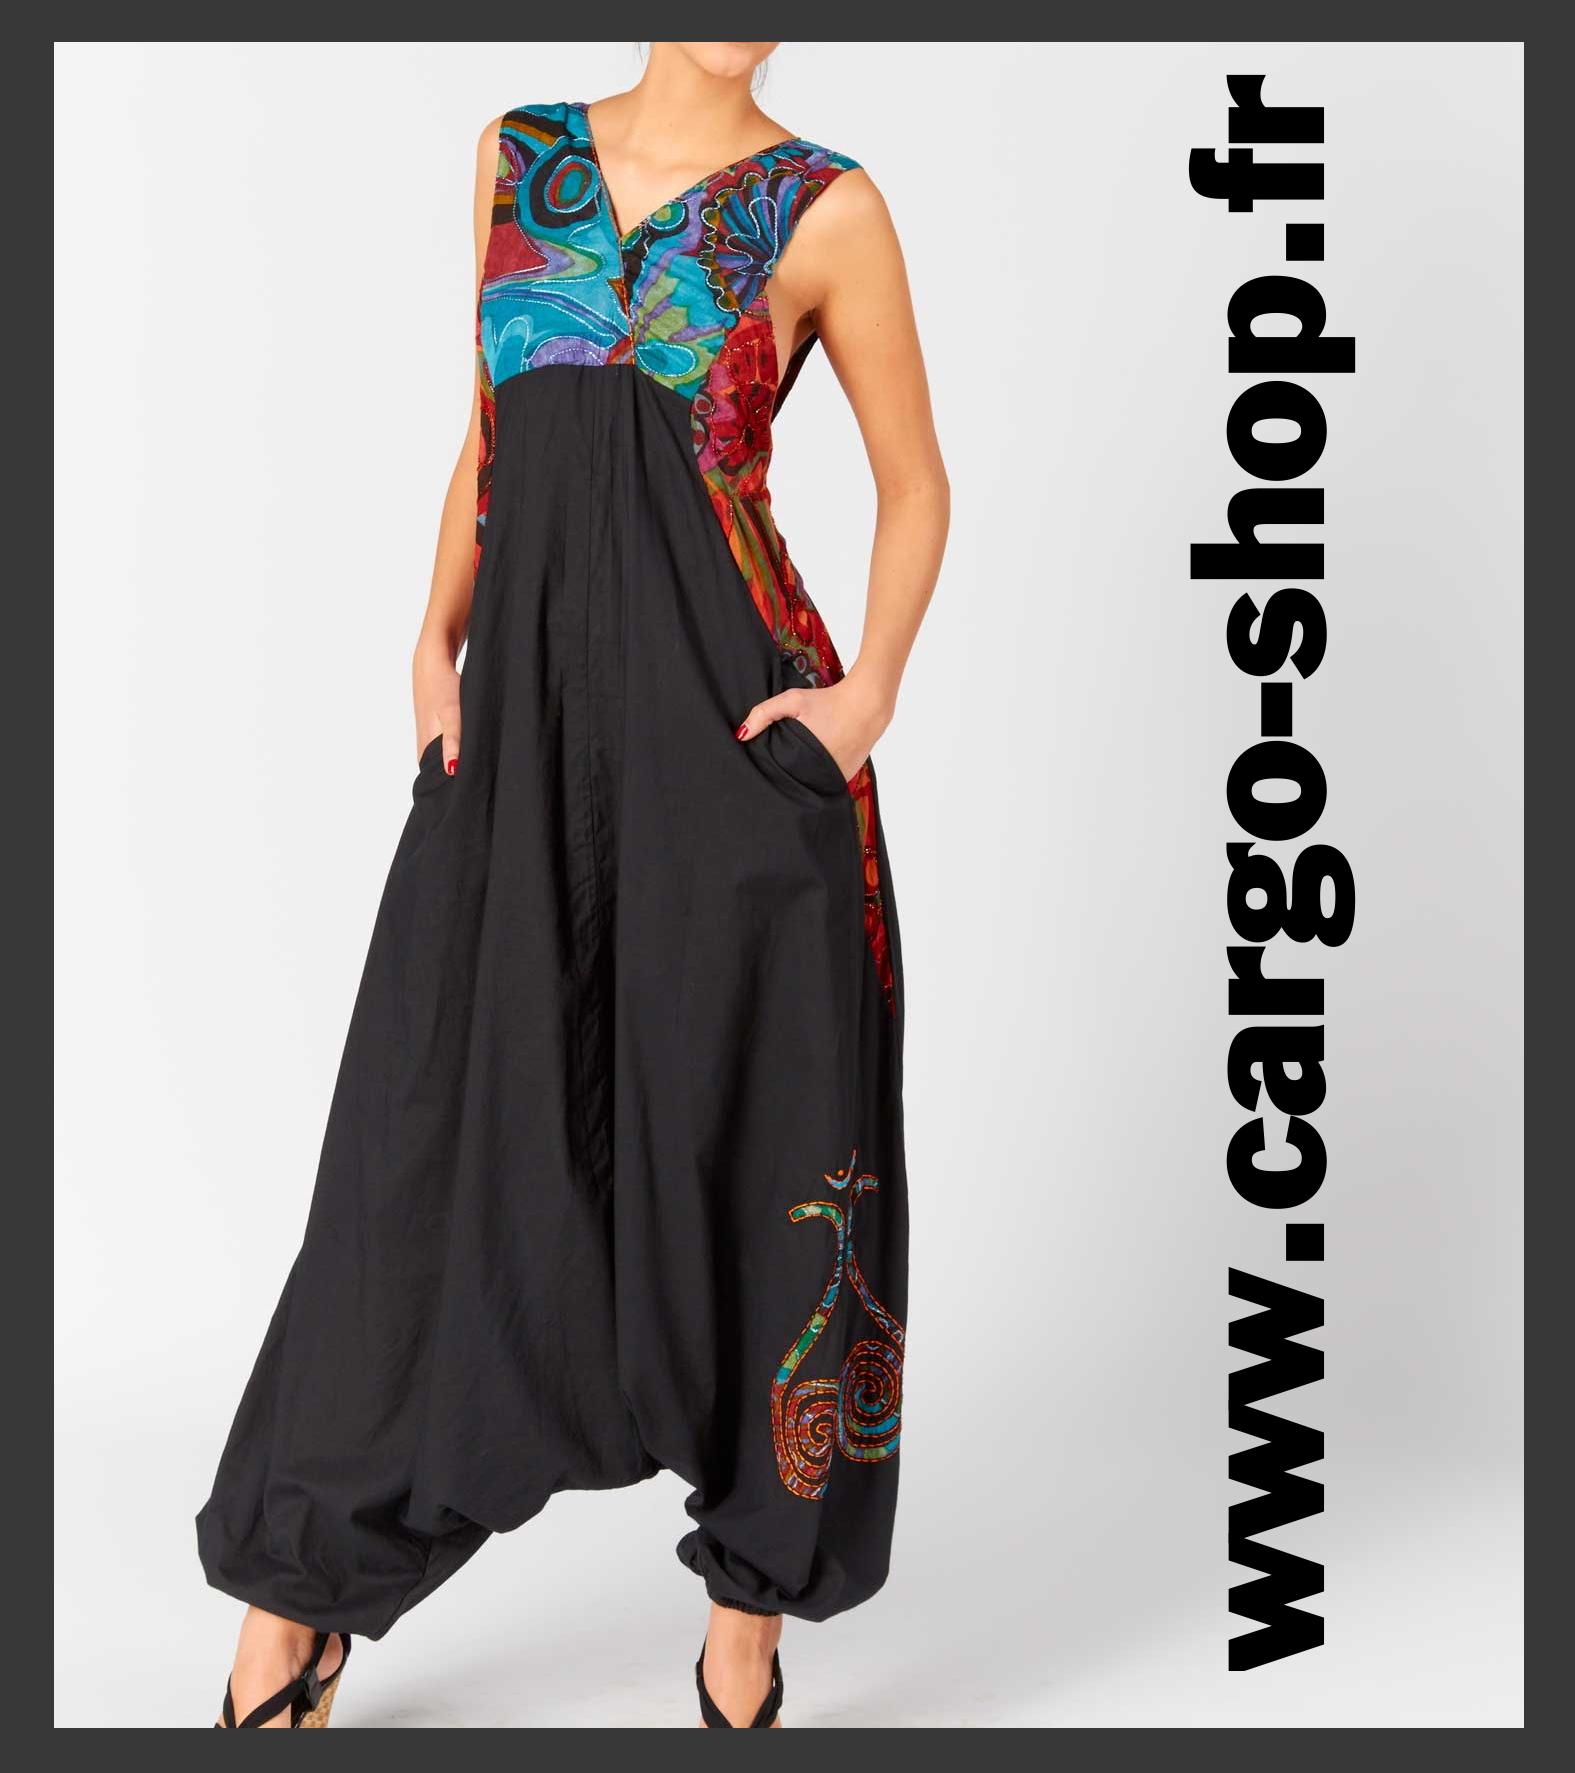 la mode ethnique cest quoi